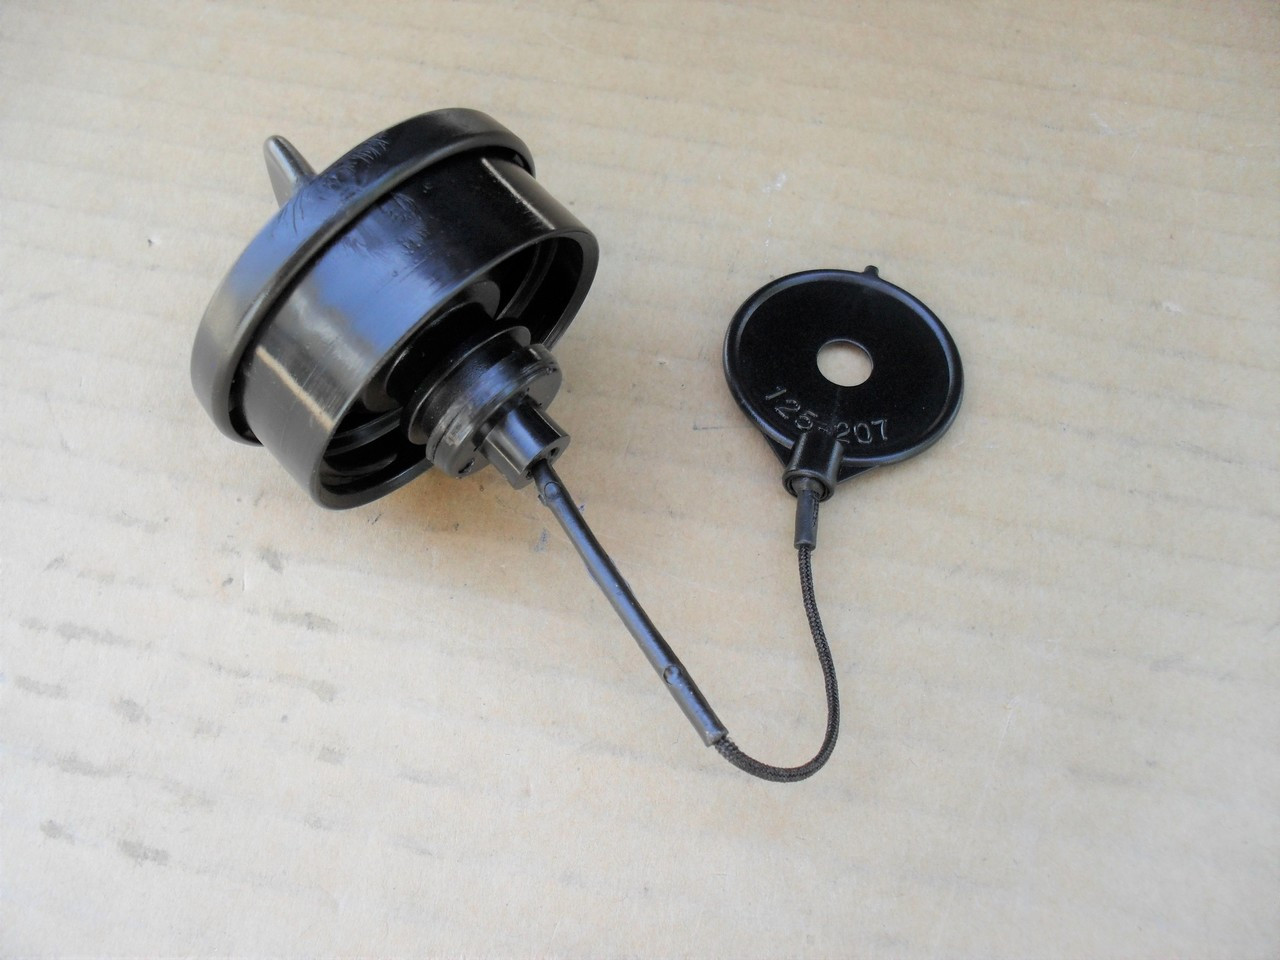 Gas Fuel Cap for Stihl FS48, FS56, FS66, FS72, FS74, FS76